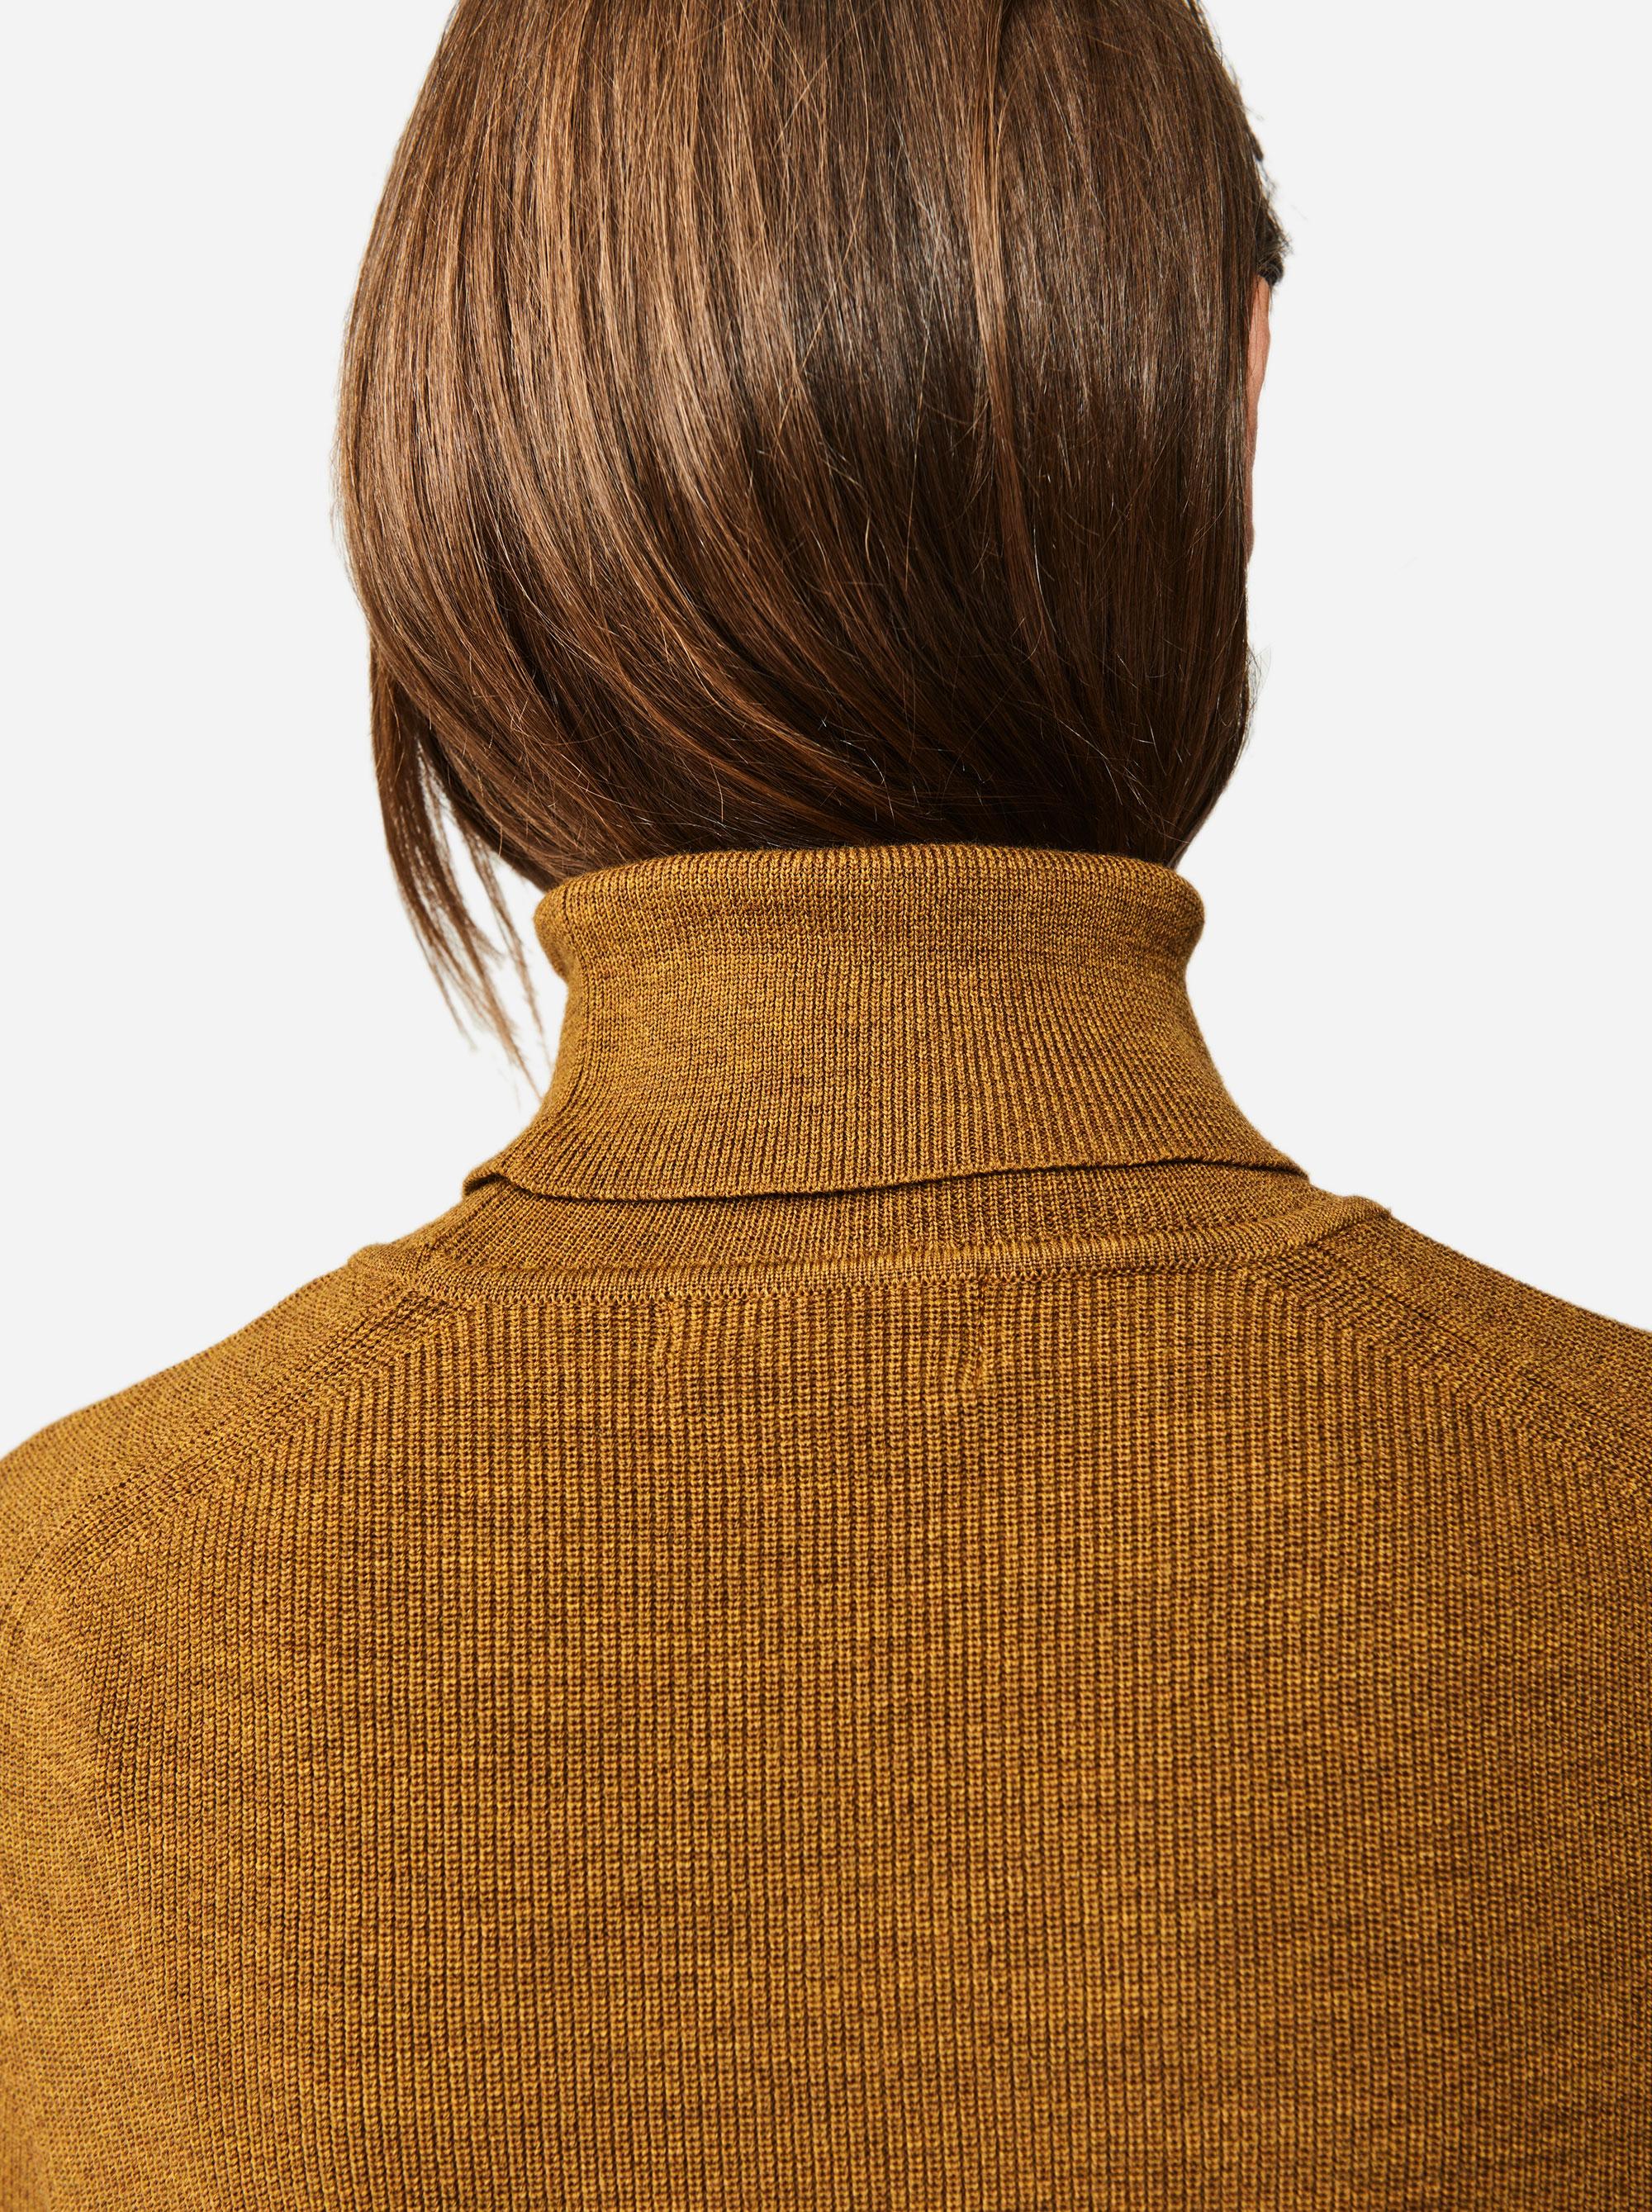 Teym - Turtleneck - The Merino Sweater - Women - Camel - 2